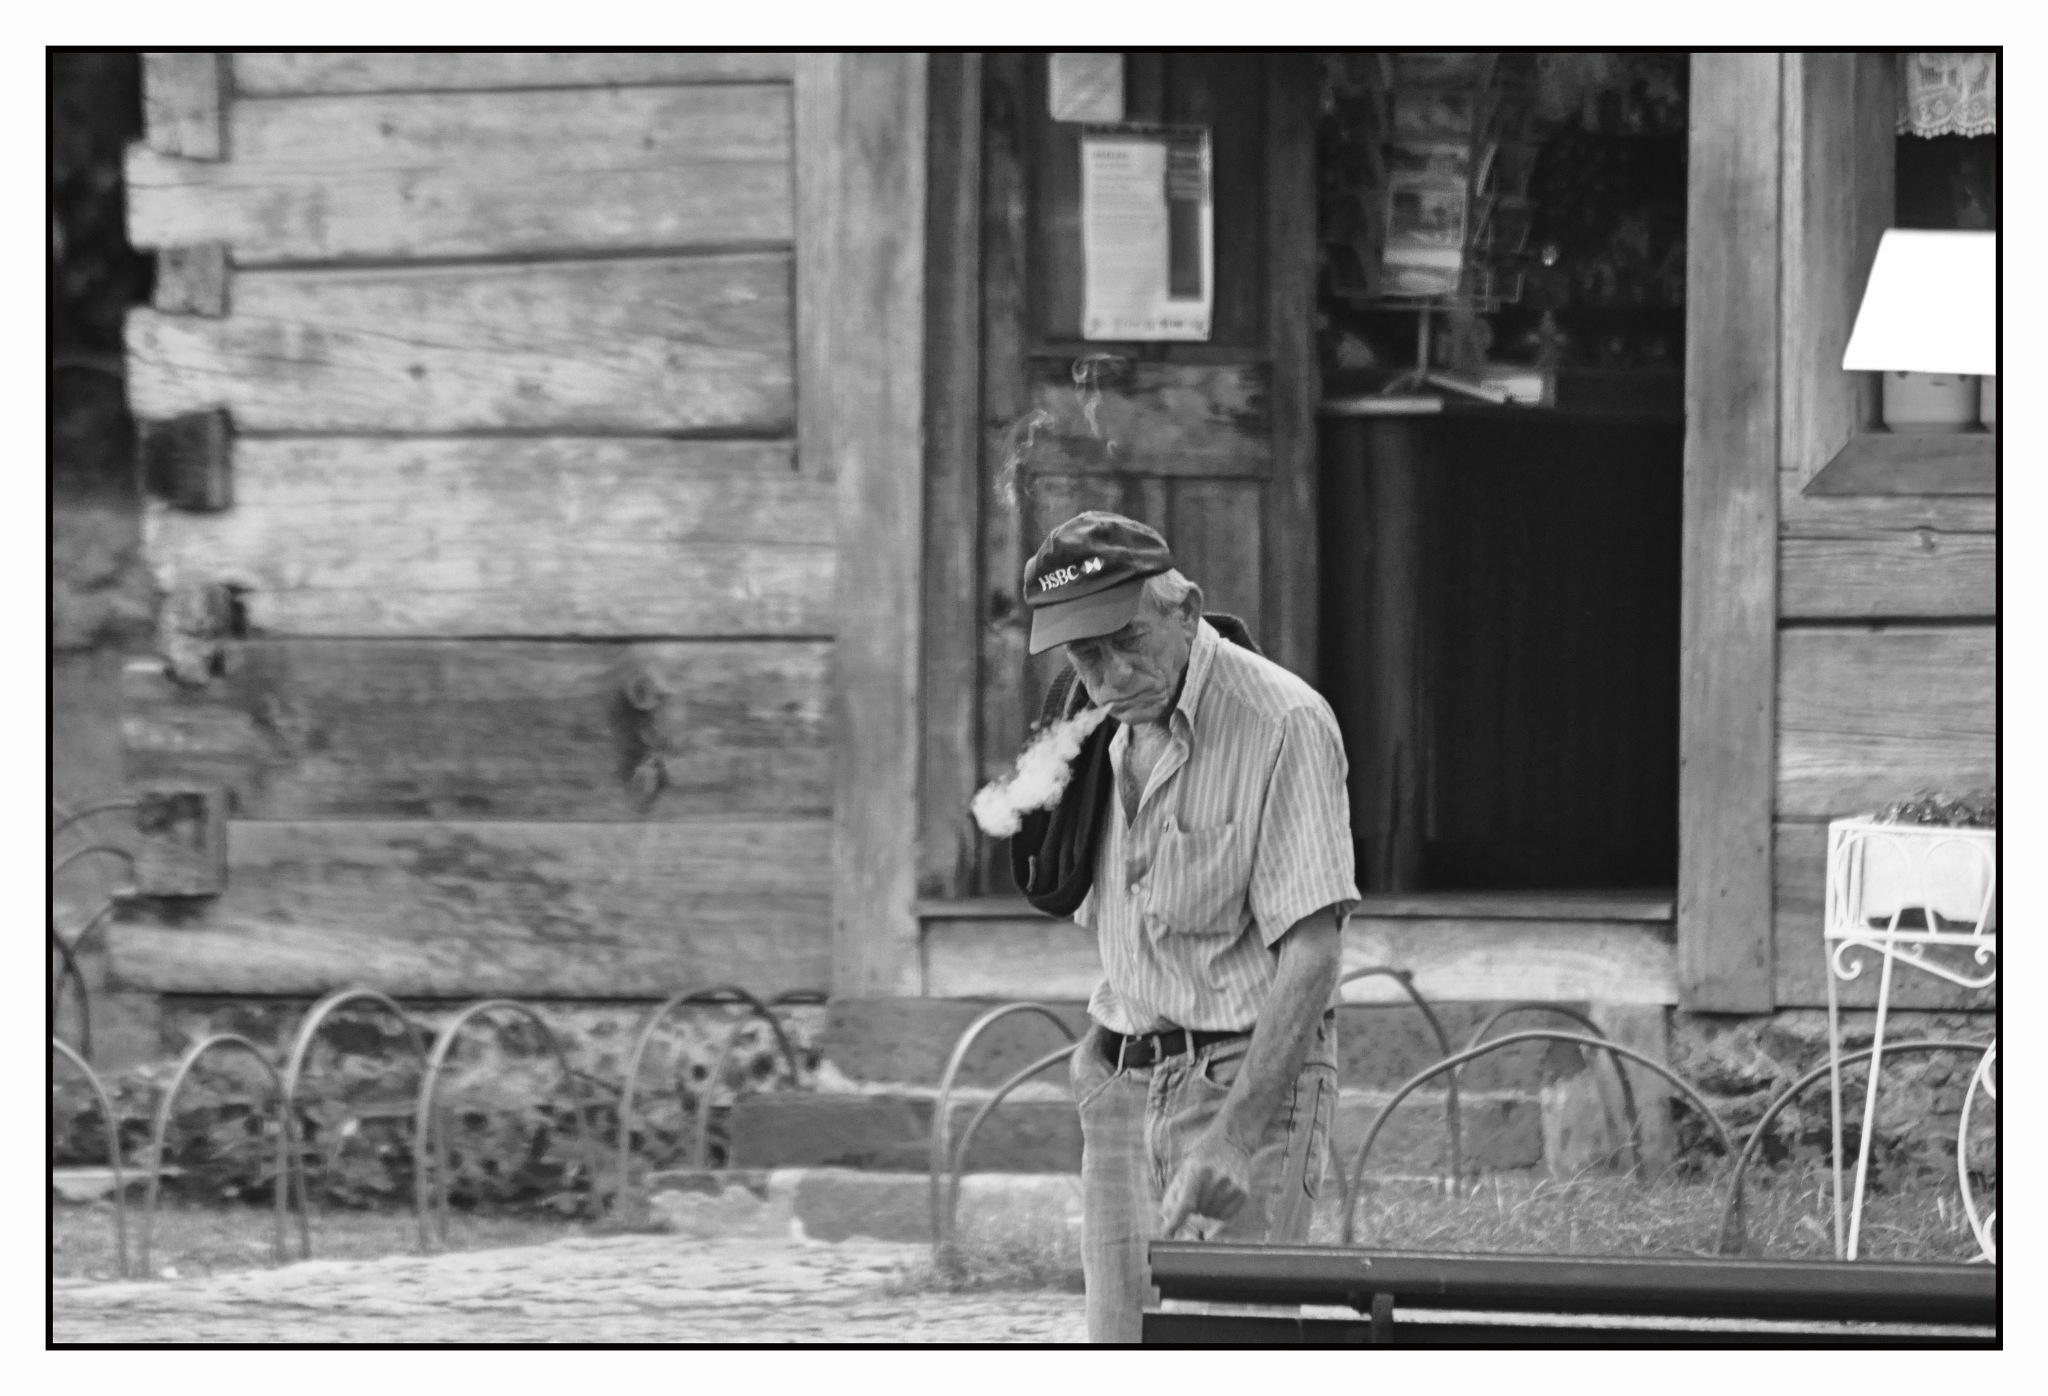 Old man by José Evaldo Suassuna de Oliveira